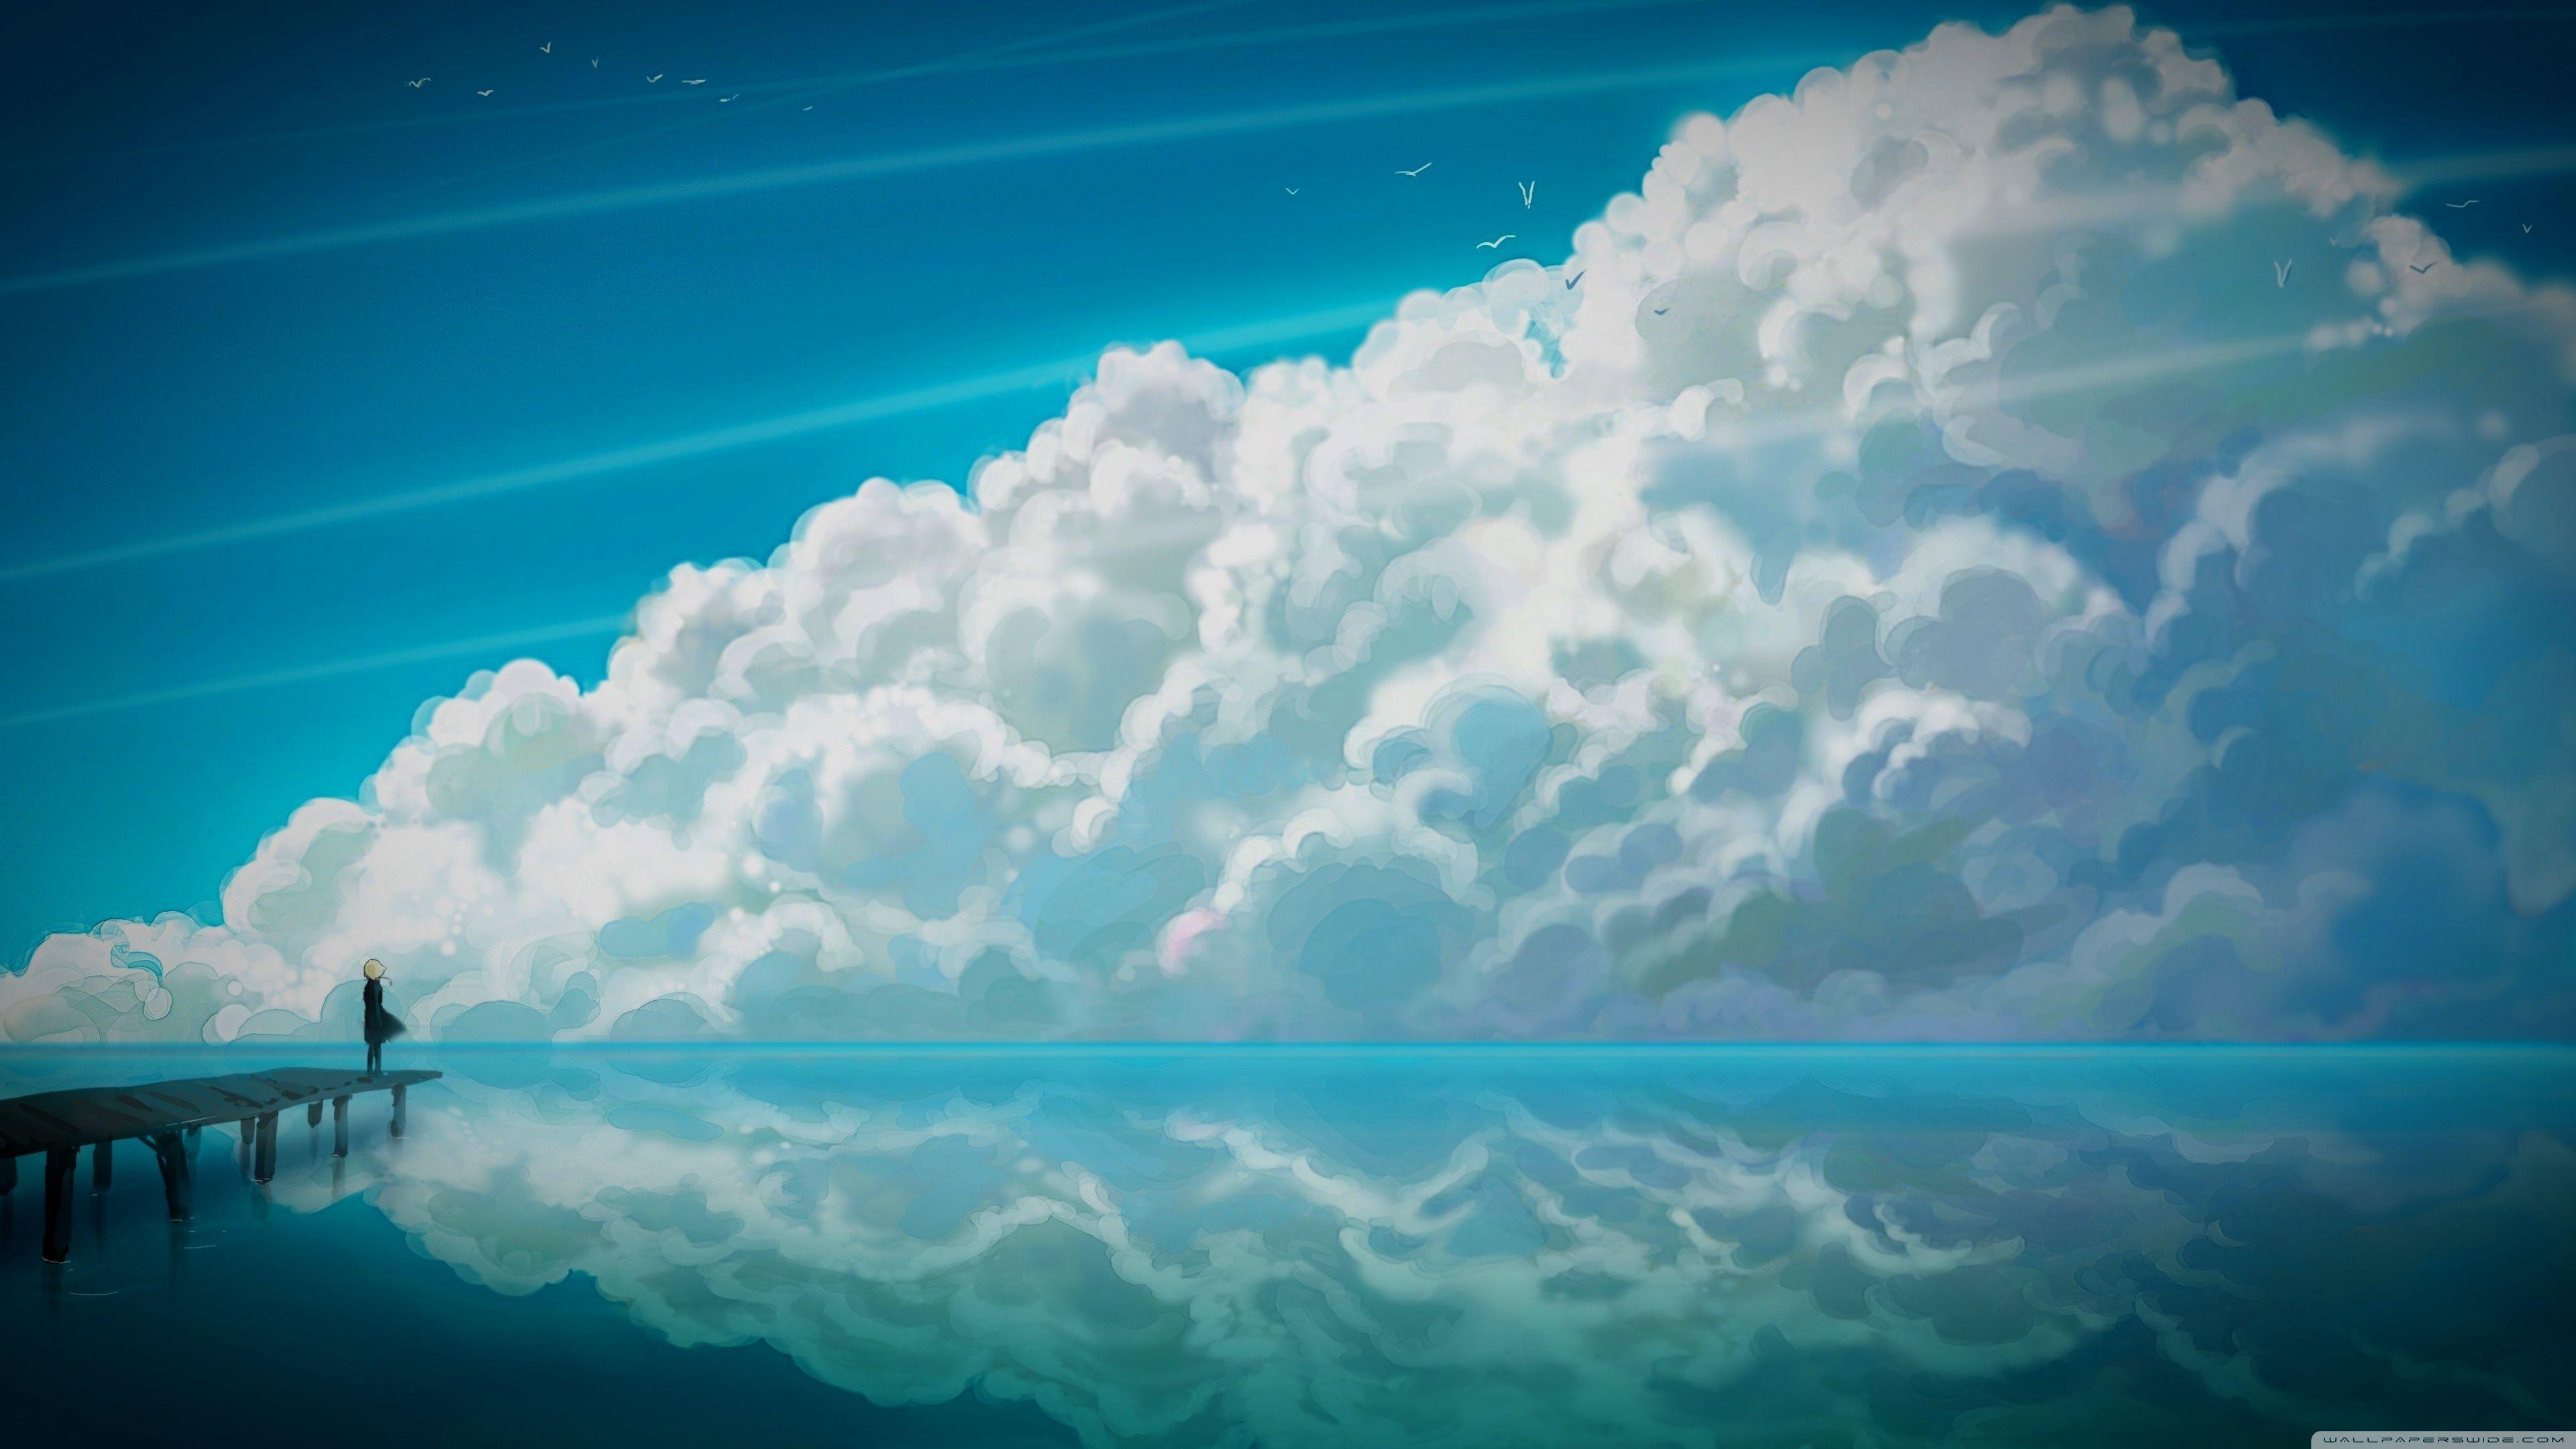 Ultra Hd Desktop Anime Sky Wallpapers - Wallpaper Cave